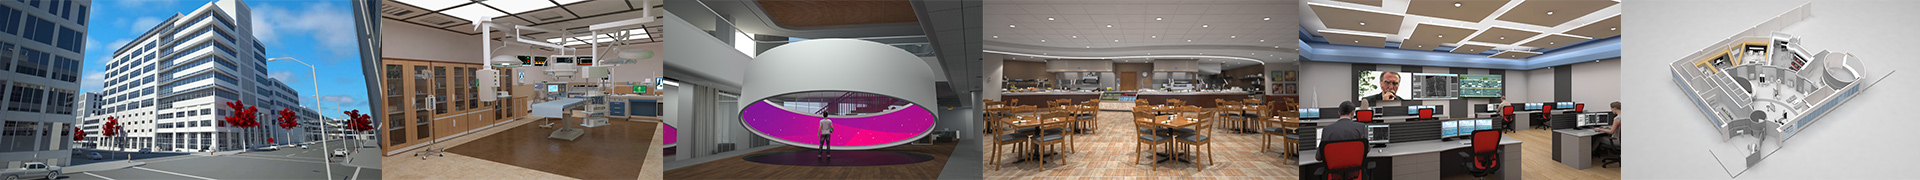 Portland 3D architectural visualization